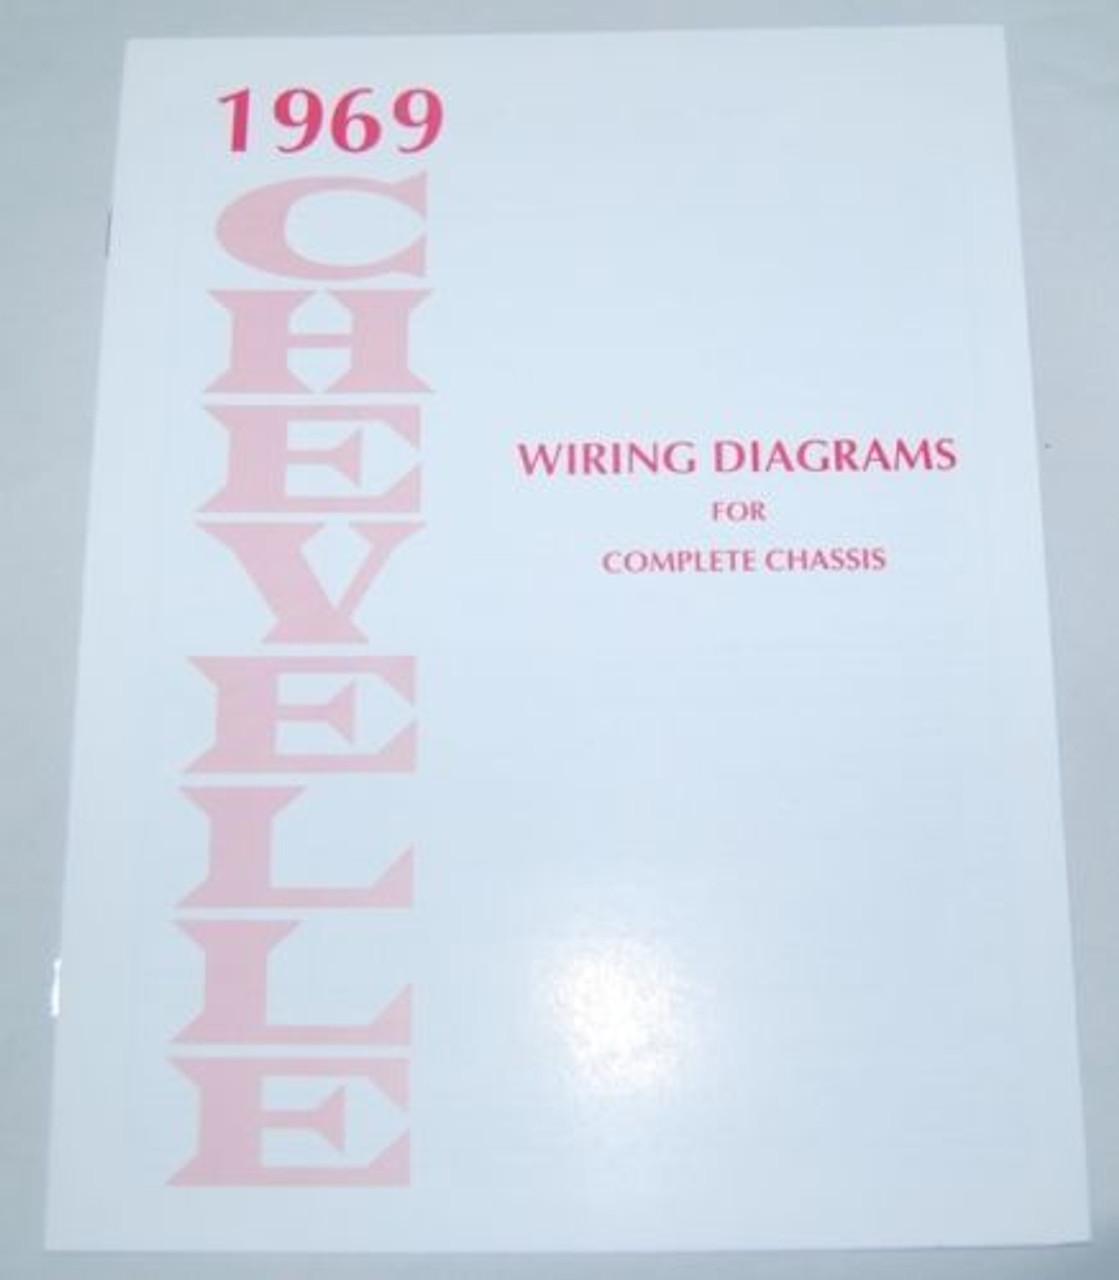 69 1969 CHEVELLE EL CAMINO ELECTRICAL WIRING DIAGRAM ...